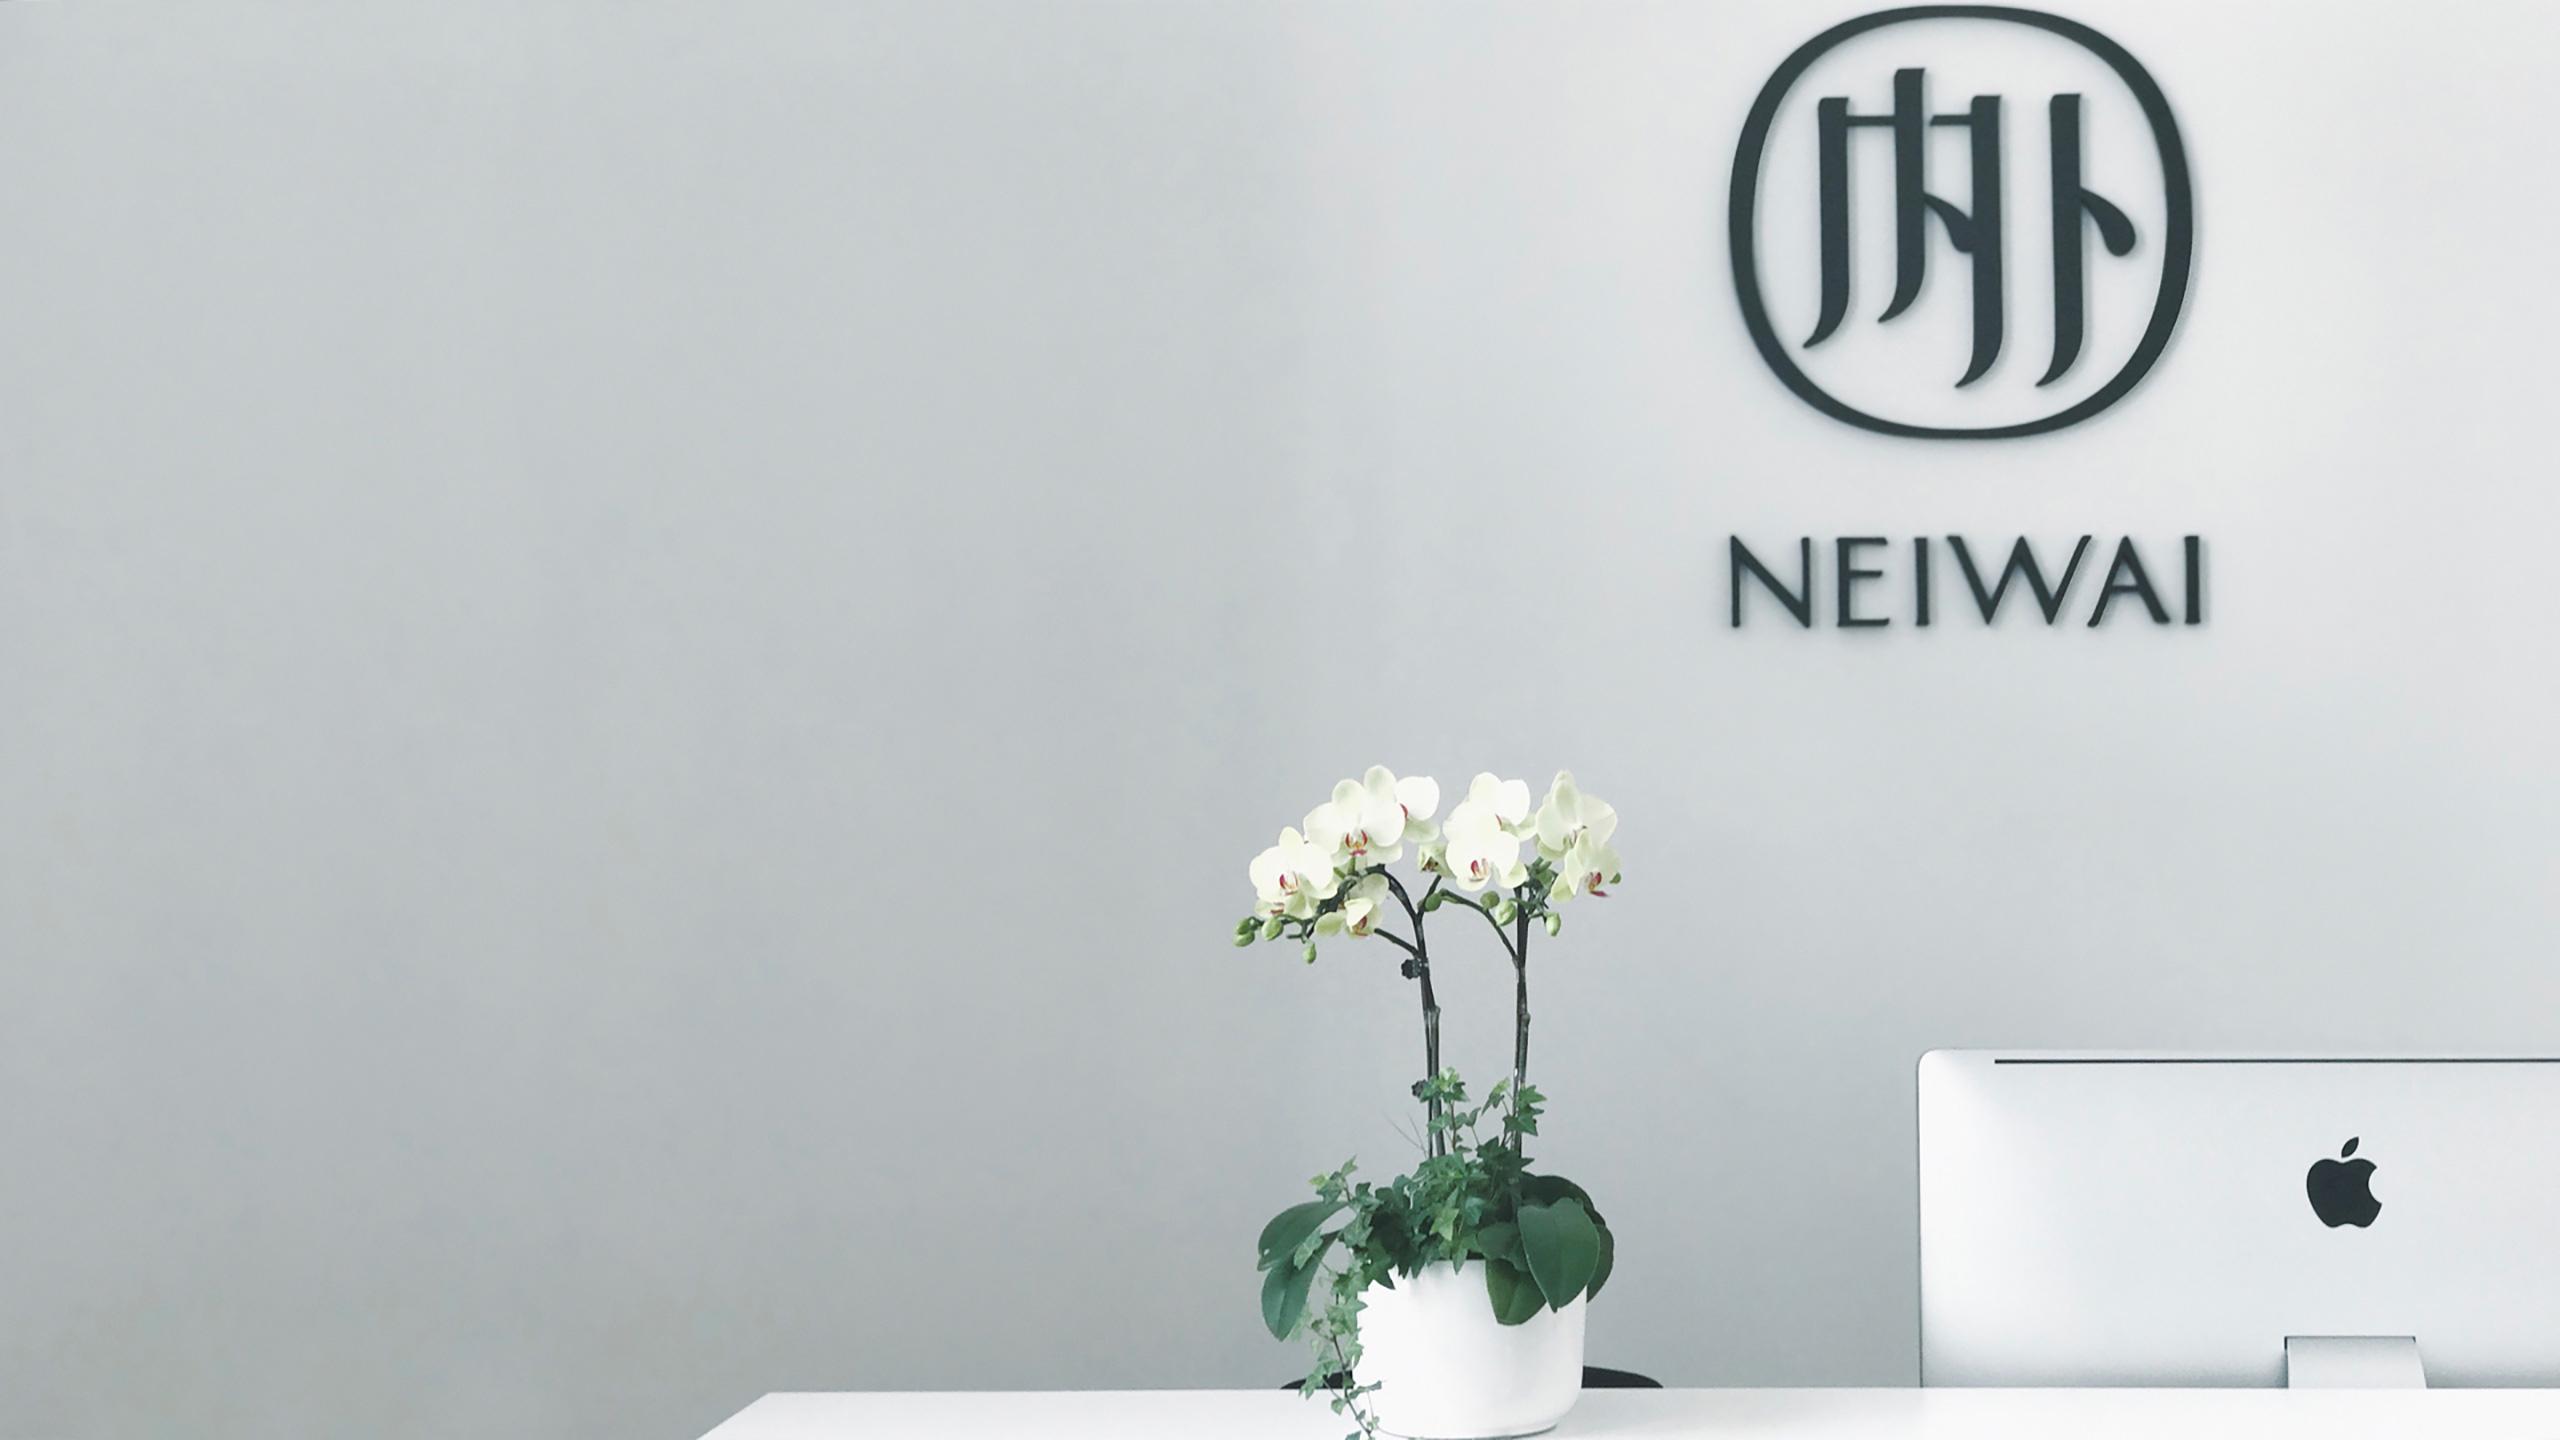 http://version-sh.cn/?portfolio=neiwai